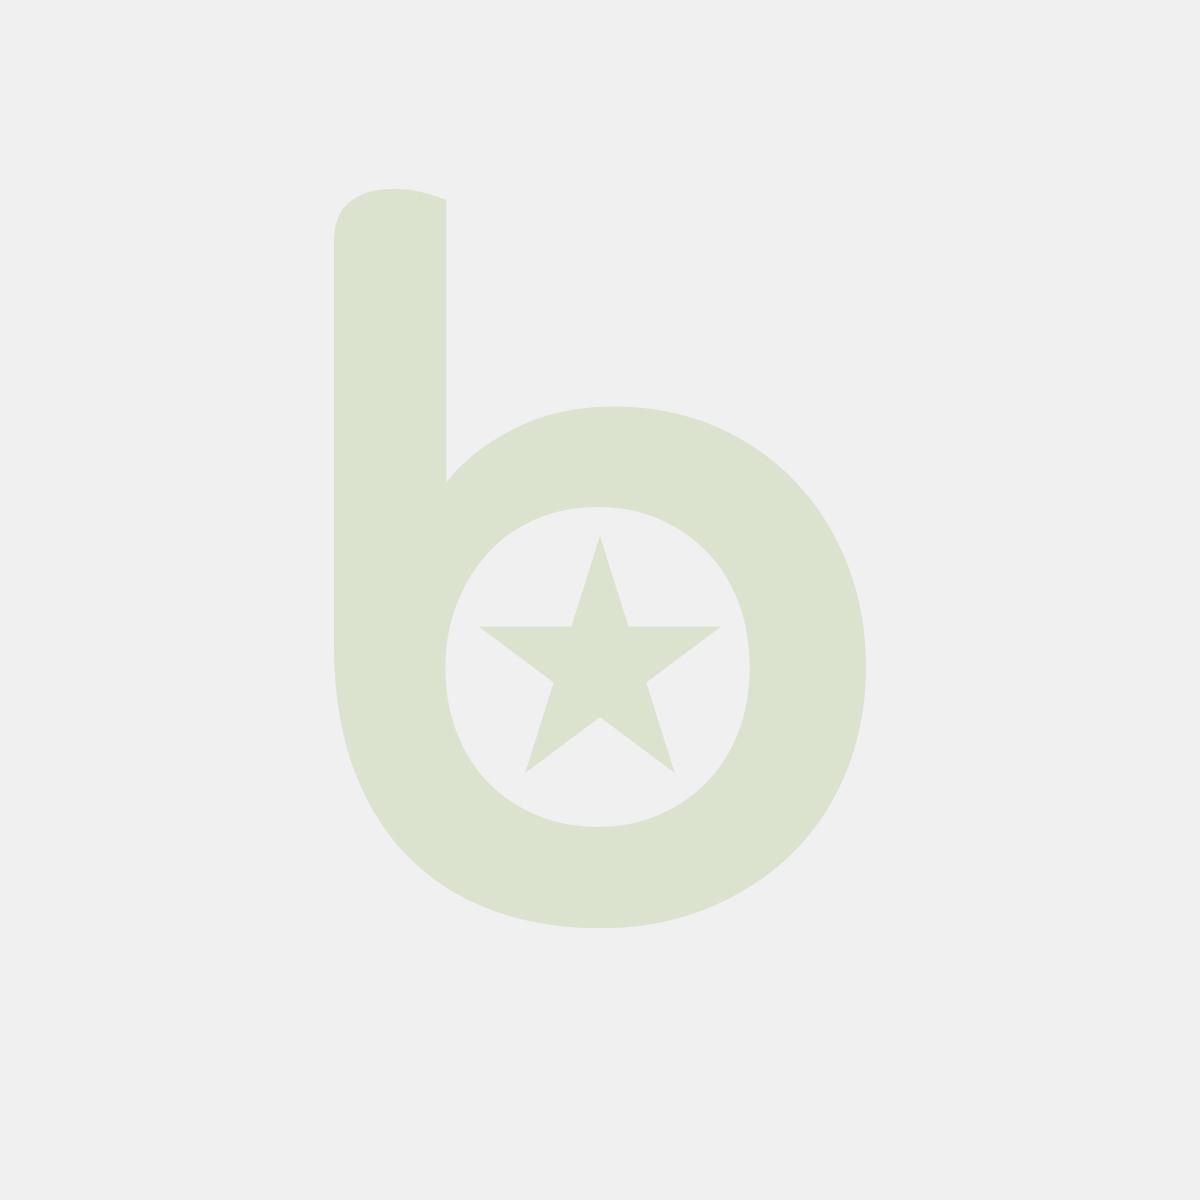 FINGERFOOD - pucharek PS transparentny 65ml 5,4x5,4x4,3 op. 25 sztuk